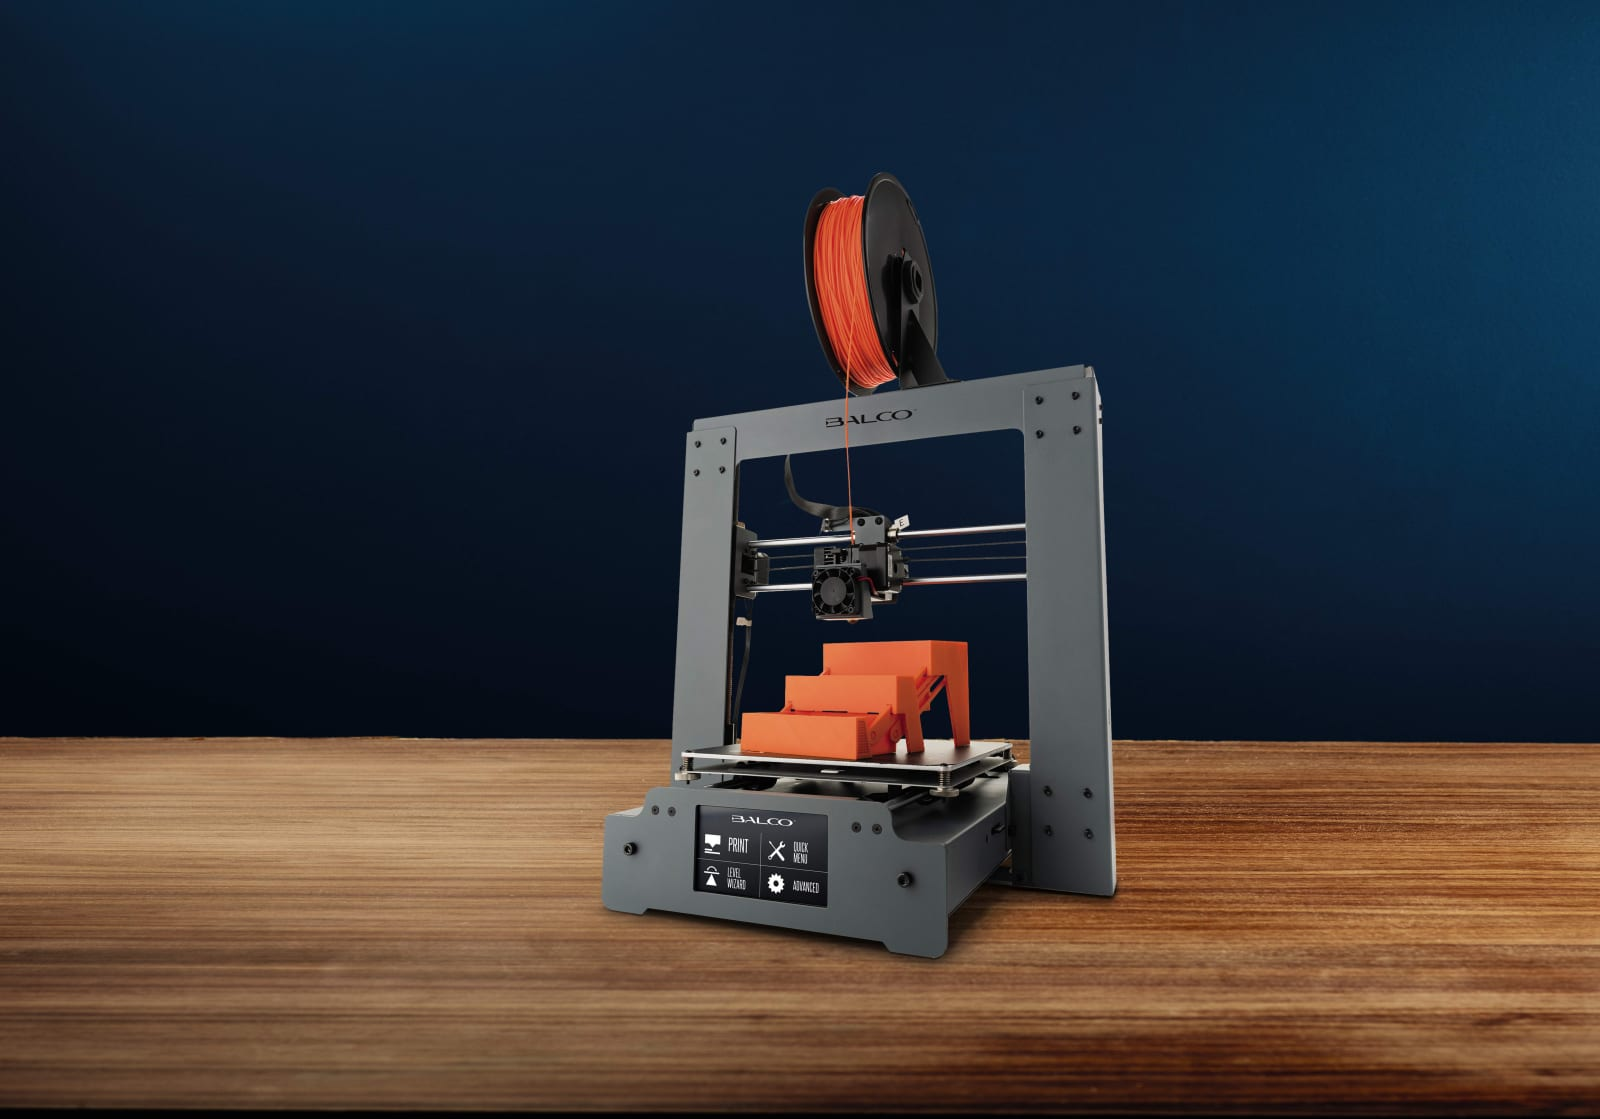 aldi s latest bargain is a 3d printer aivanet. Black Bedroom Furniture Sets. Home Design Ideas